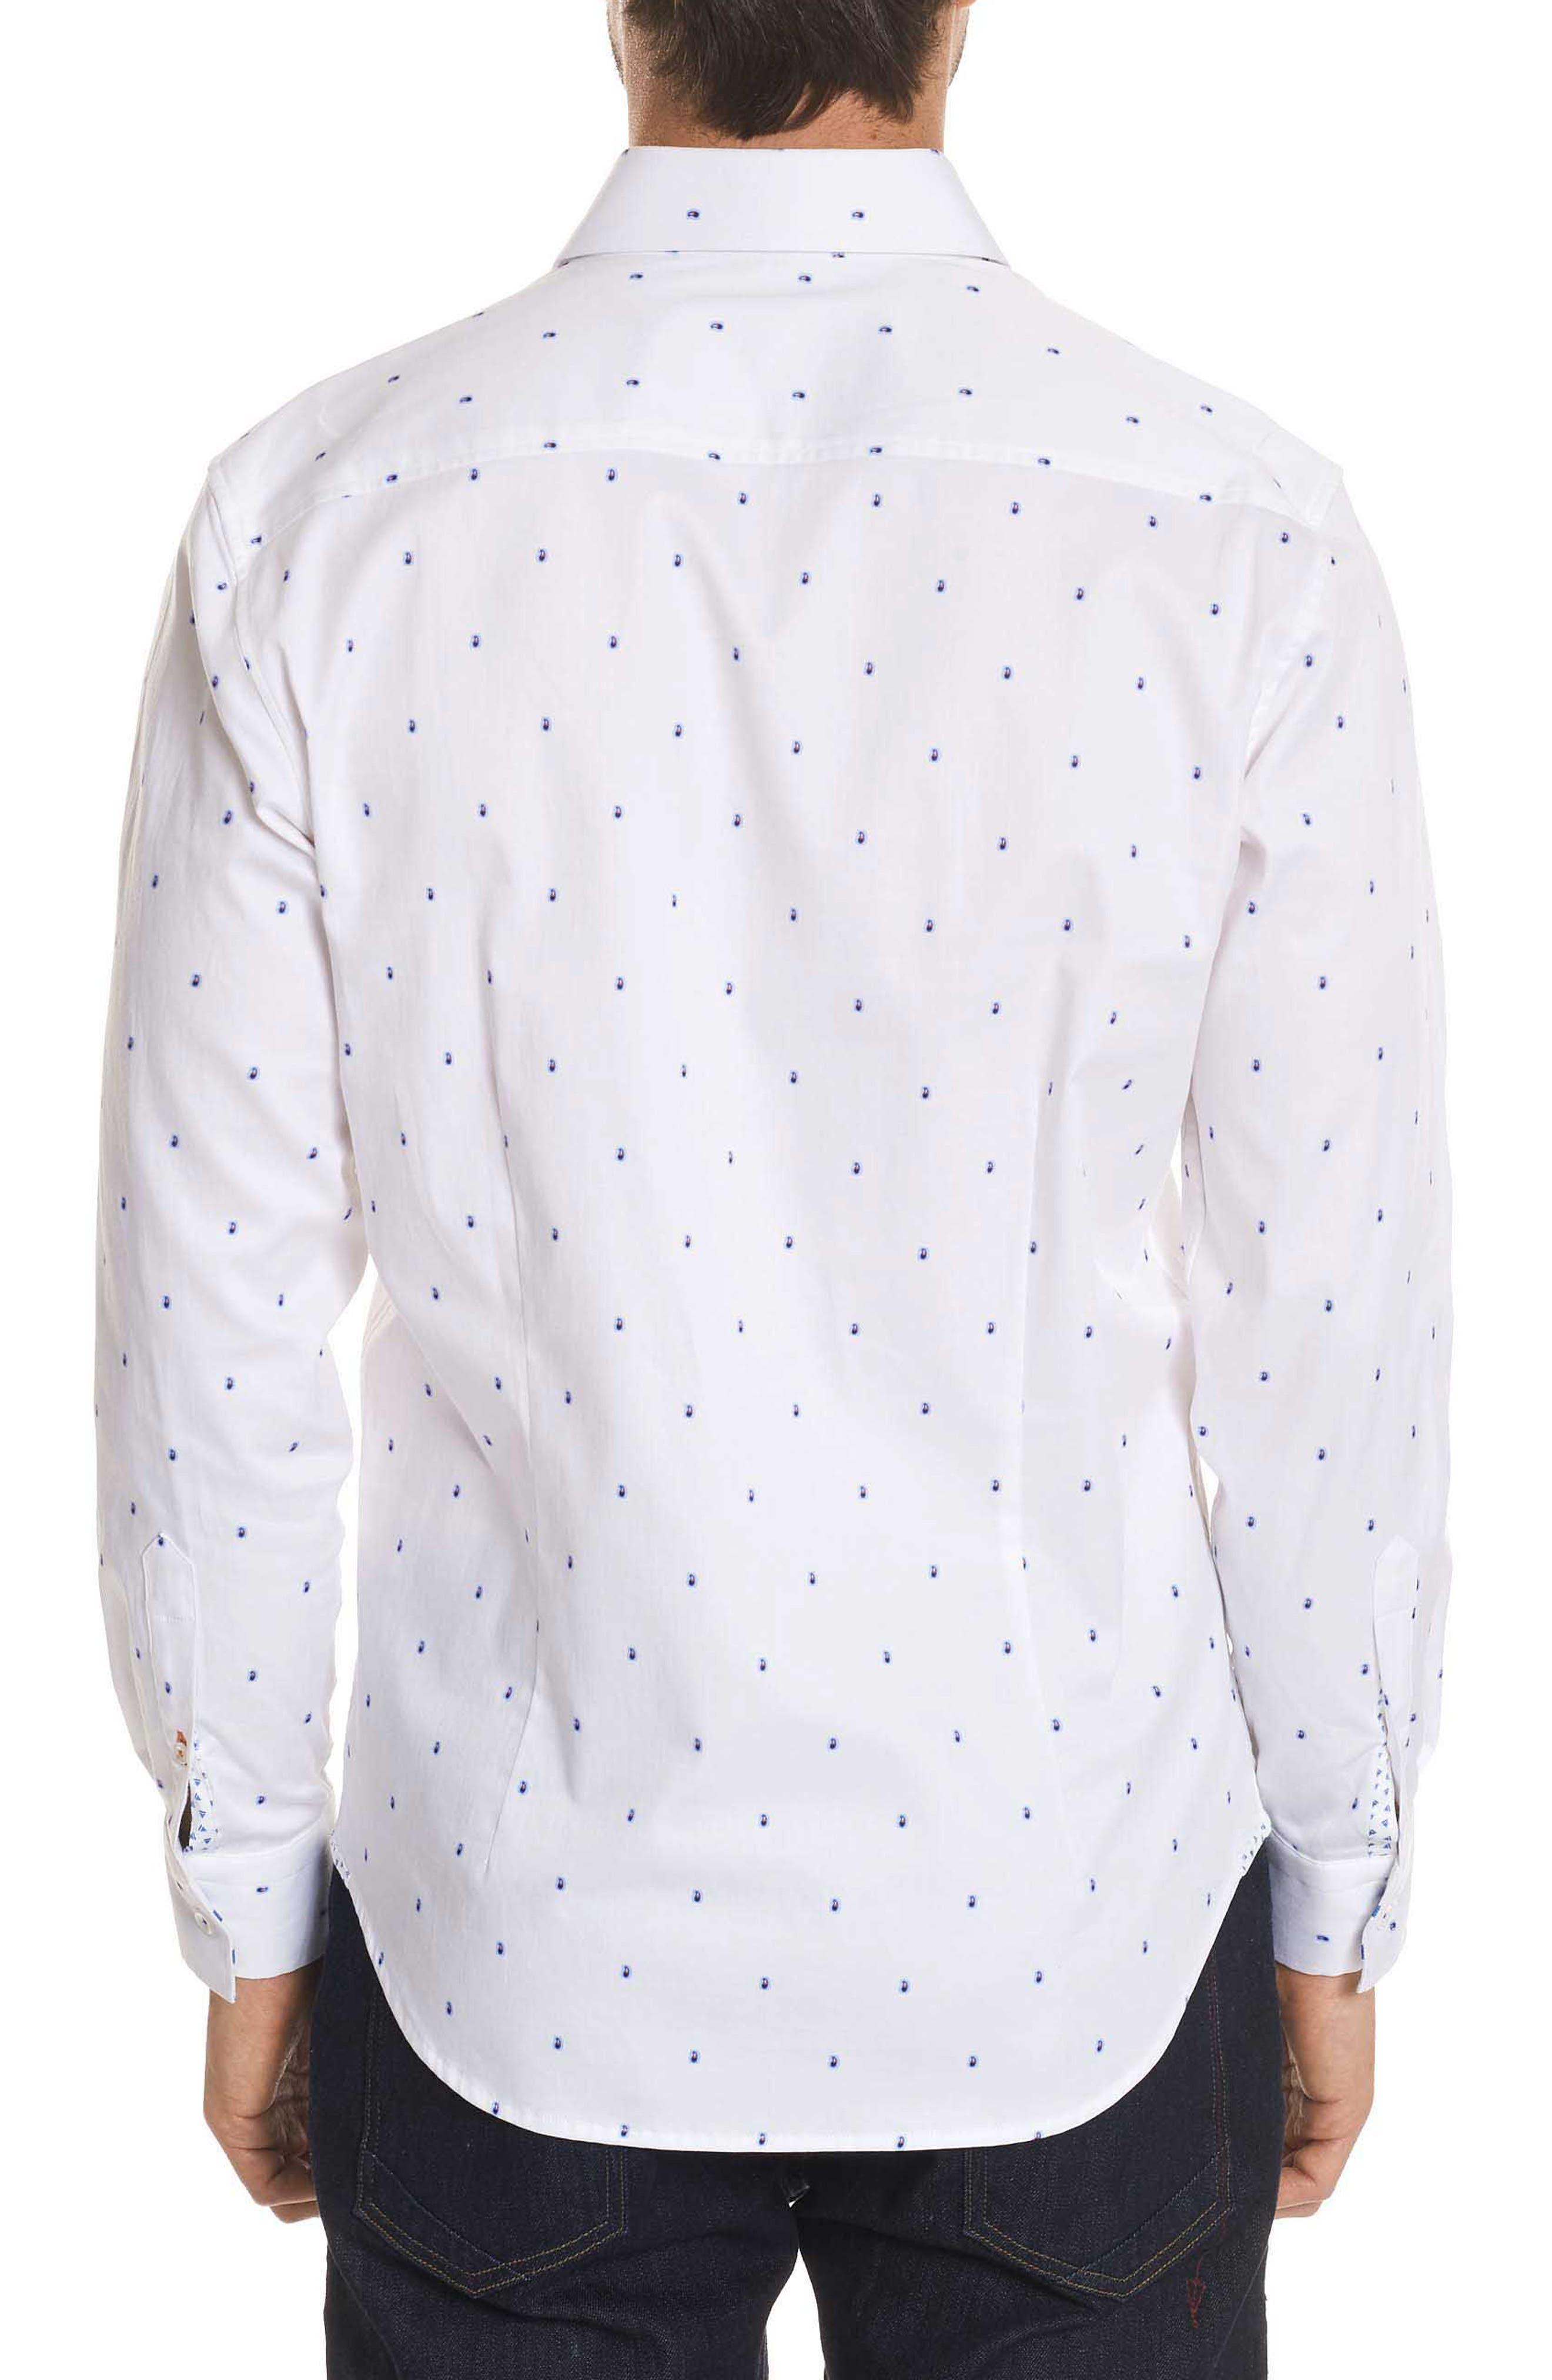 Mack Tailored Fit Sport Shirt,                             Alternate thumbnail 2, color,                             White